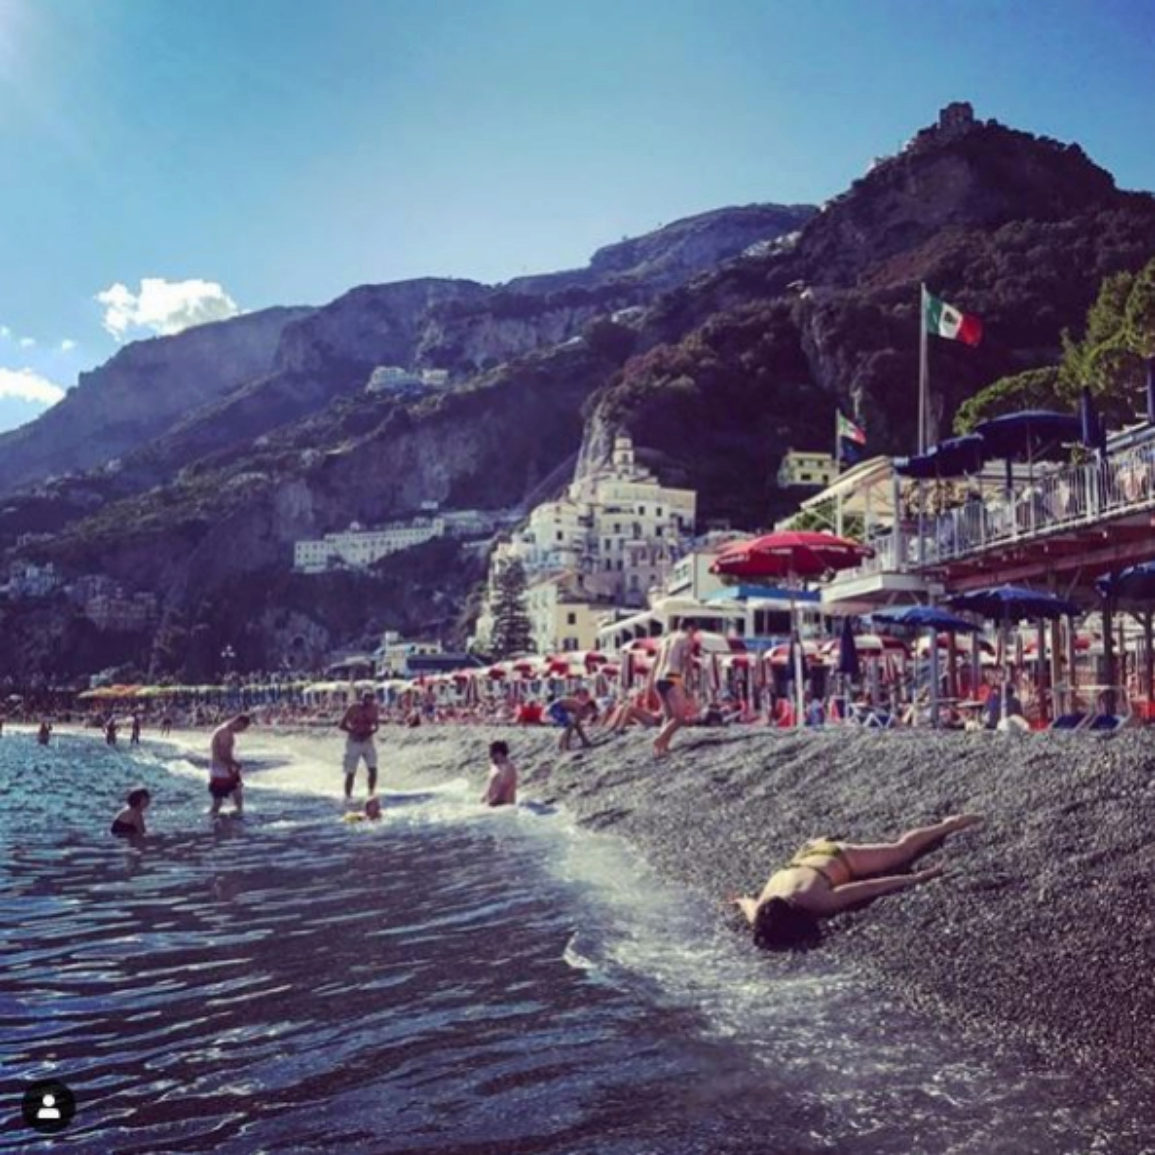 'Stef muere en la costa Amalfitana'. Costa Amalfitana, Italia.